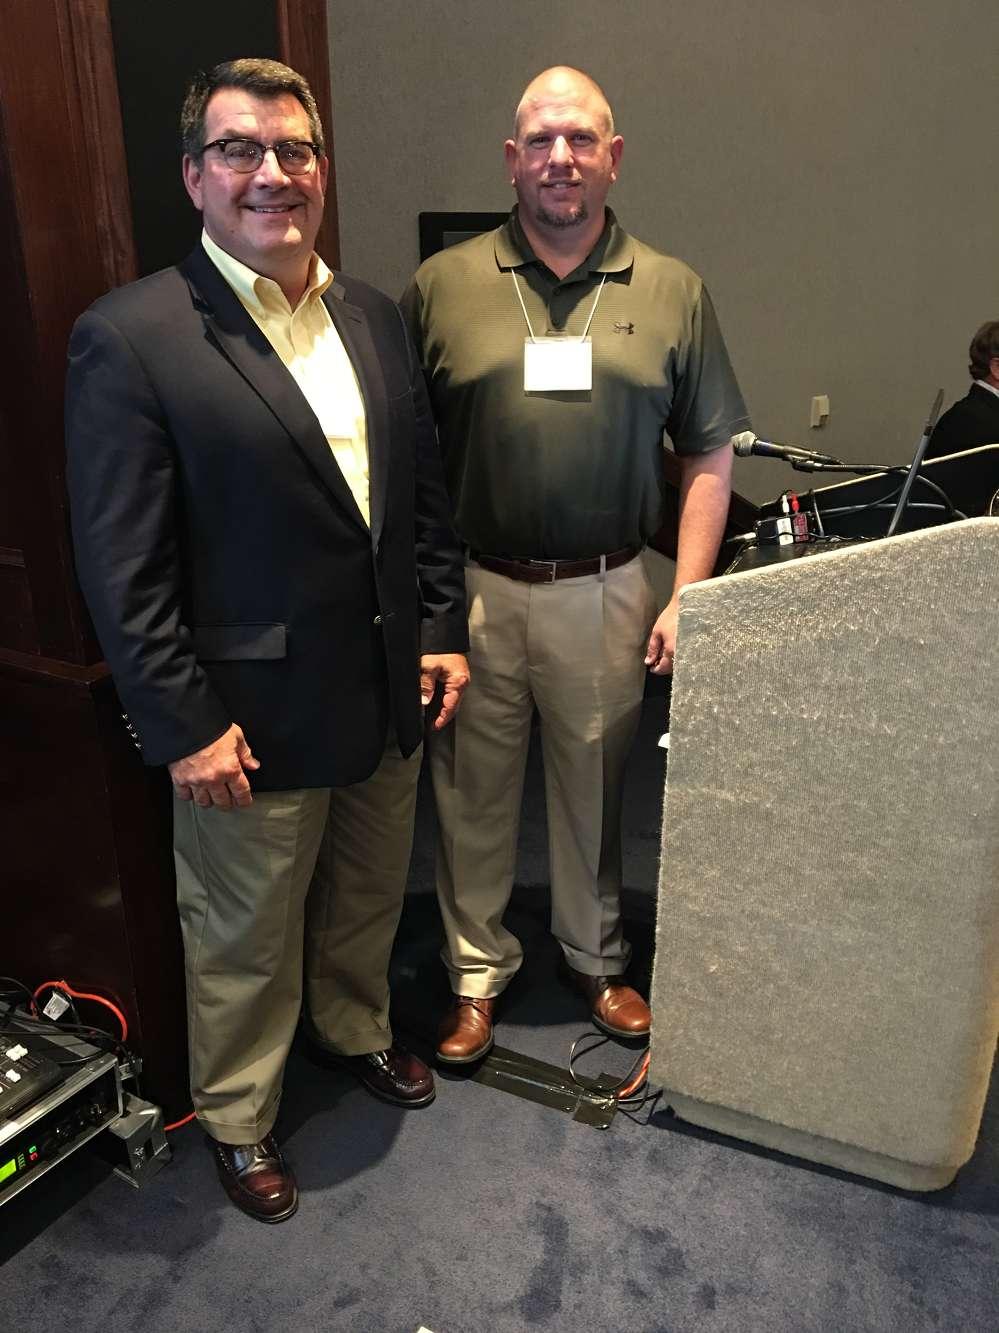 Joe Bateman (L), safety outreach director, ISRI, and Rob Jordan, ASC Construction Equipment, share a laugh at the meeting.